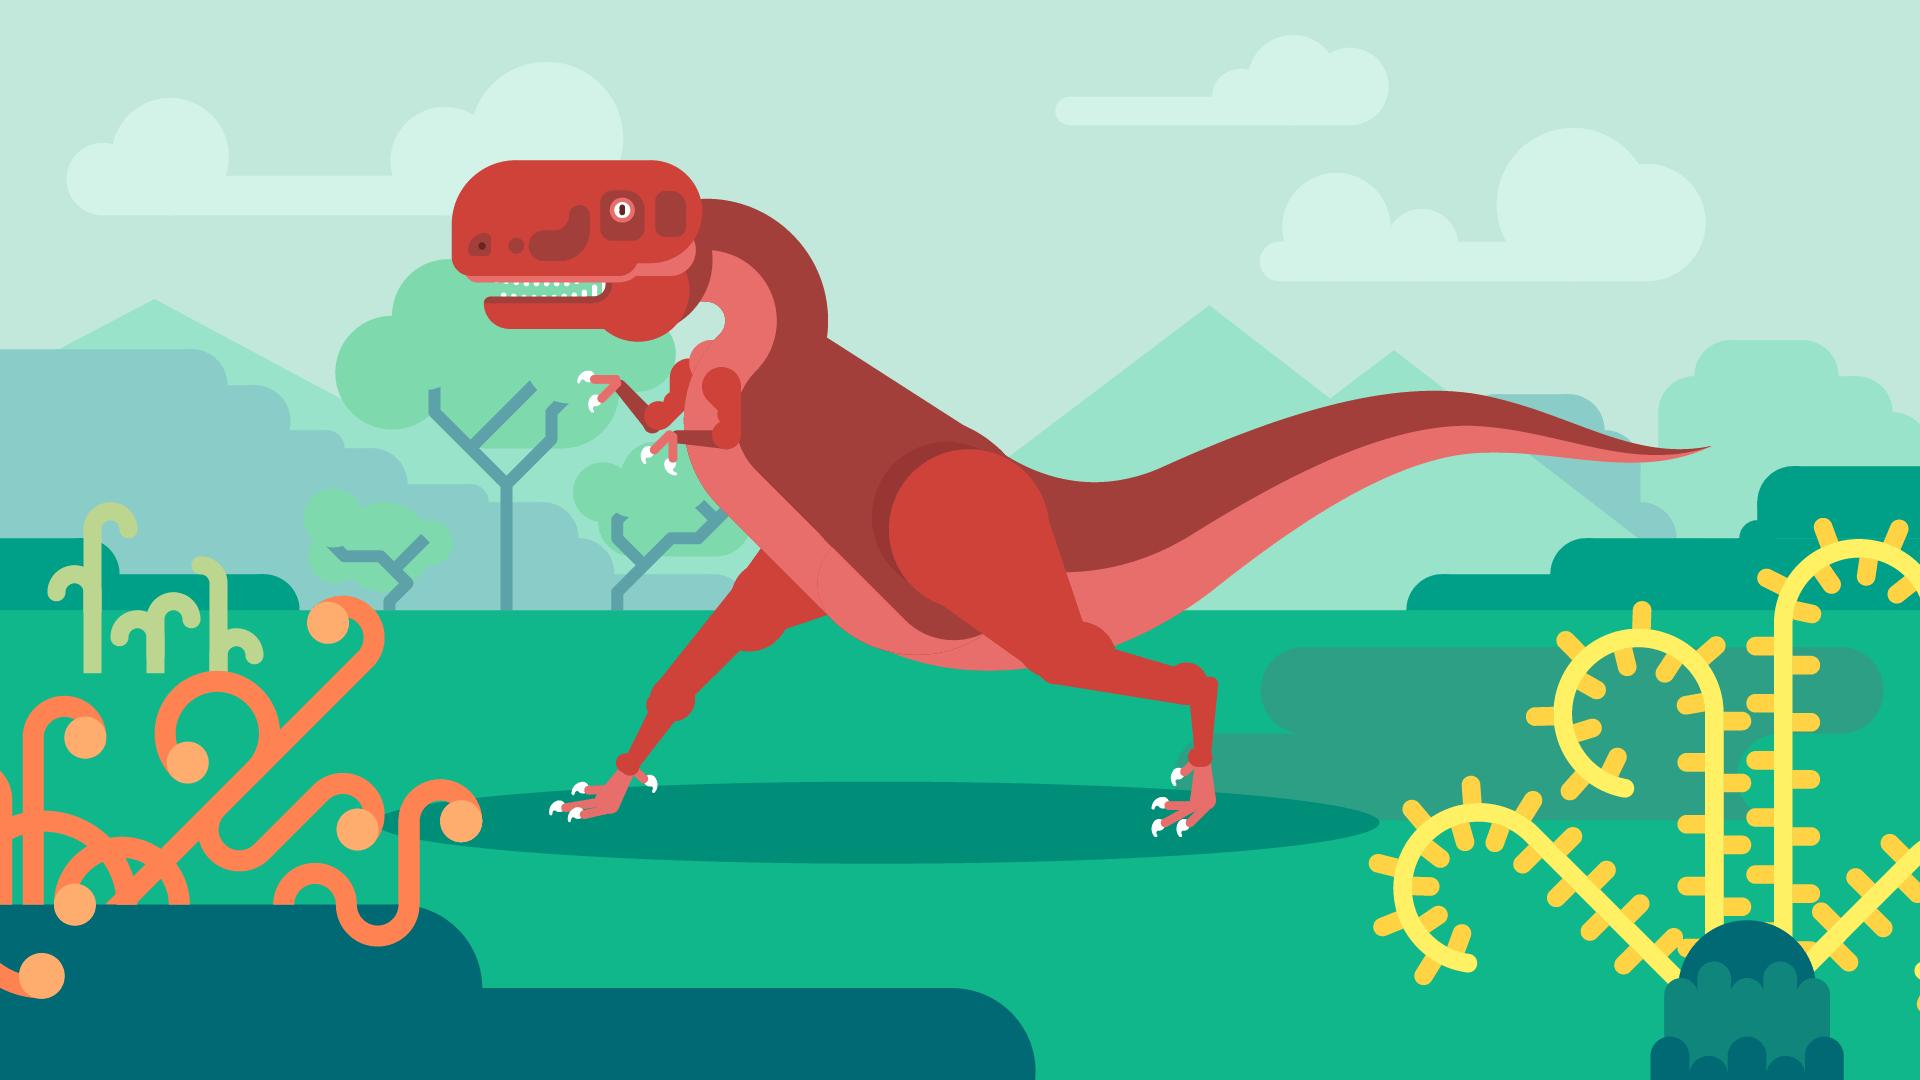 inanutshell-kurzgesagt-royal-tyrrel-museum-dinosaurs-01